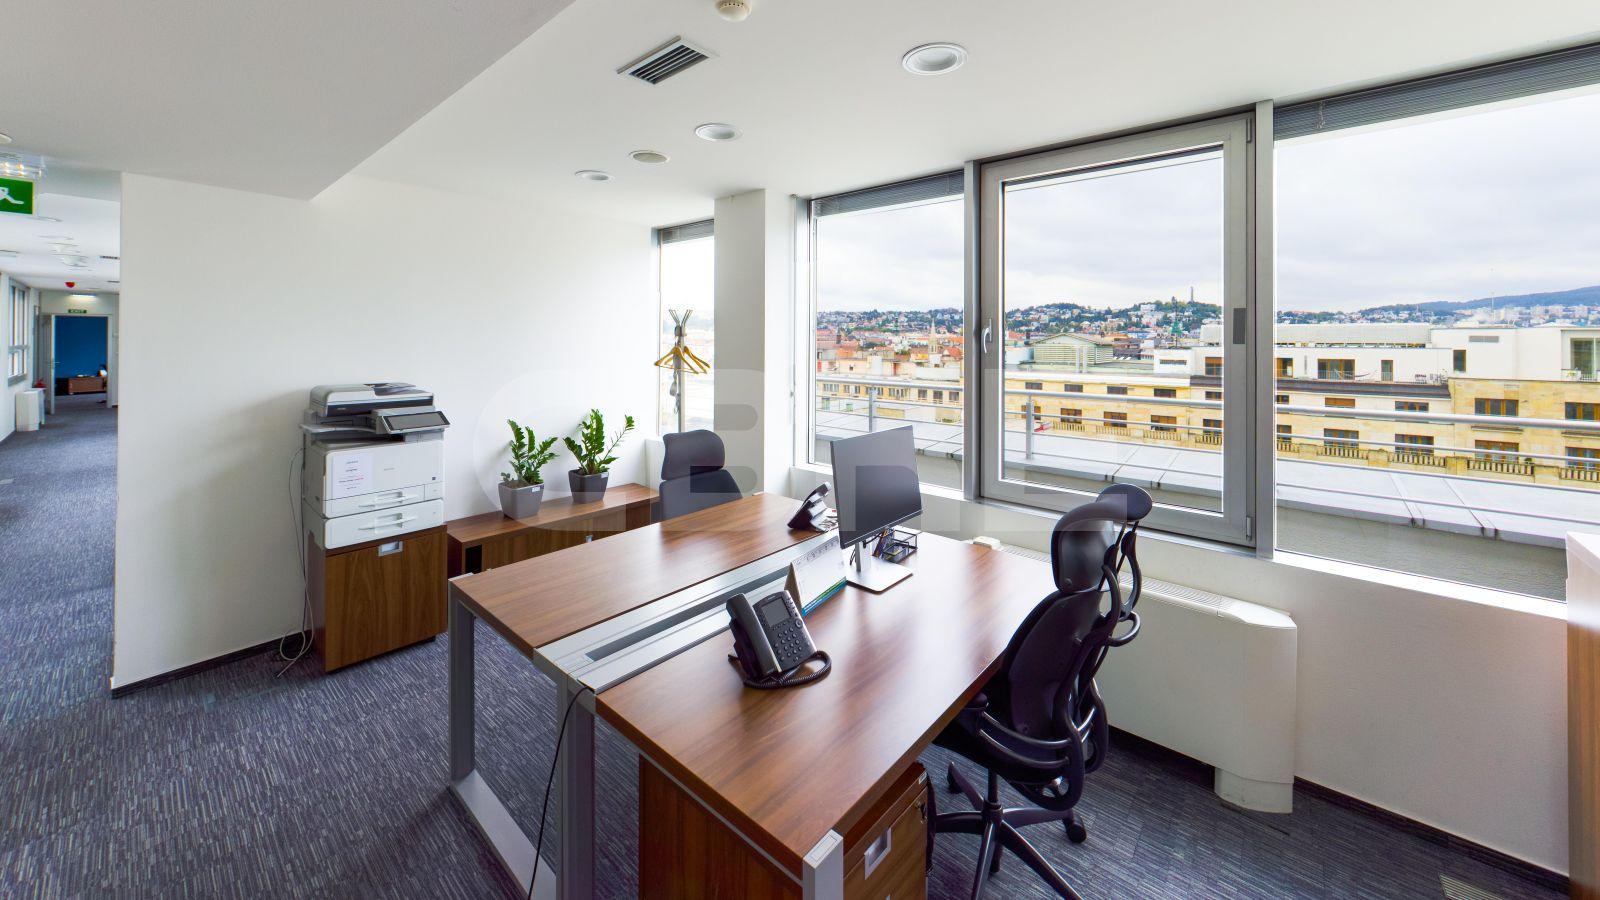 Pressburg Trade Center - Sublease, Bratislava - Staré Mesto | Offices for rent by CBRE | 3